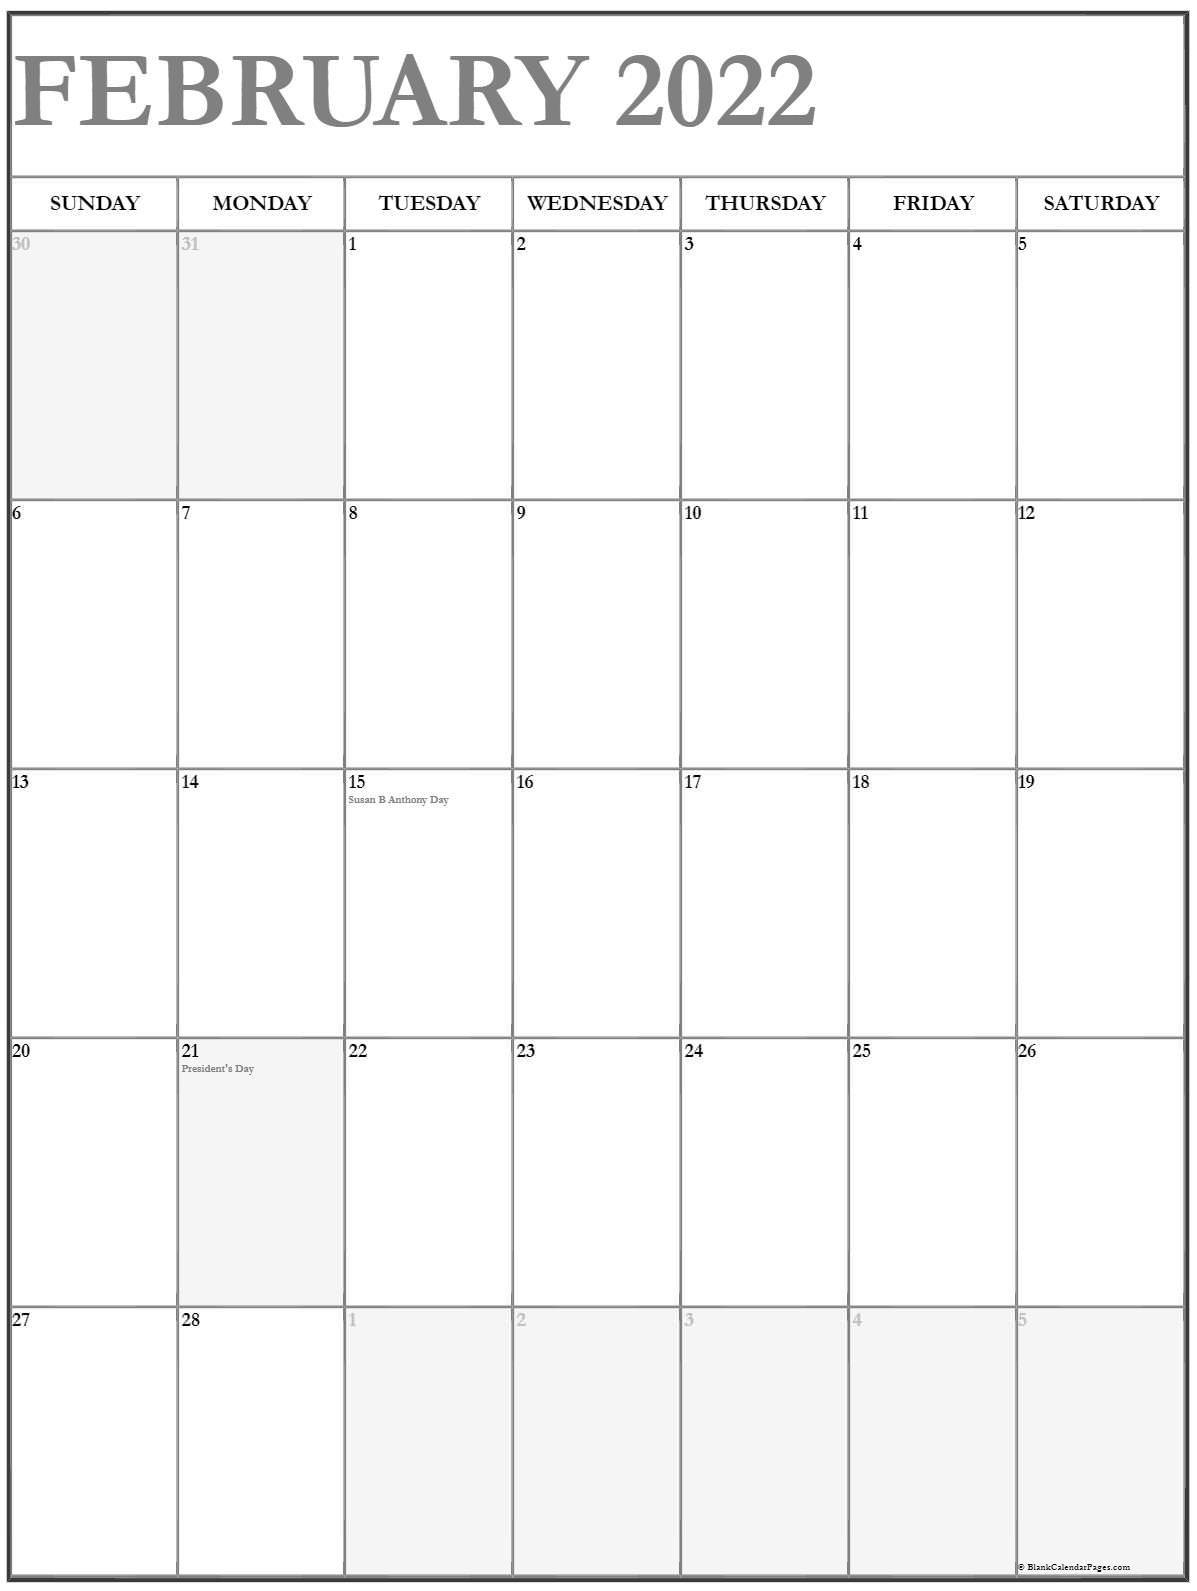 February 2022 Vertical Calendar | Portrait